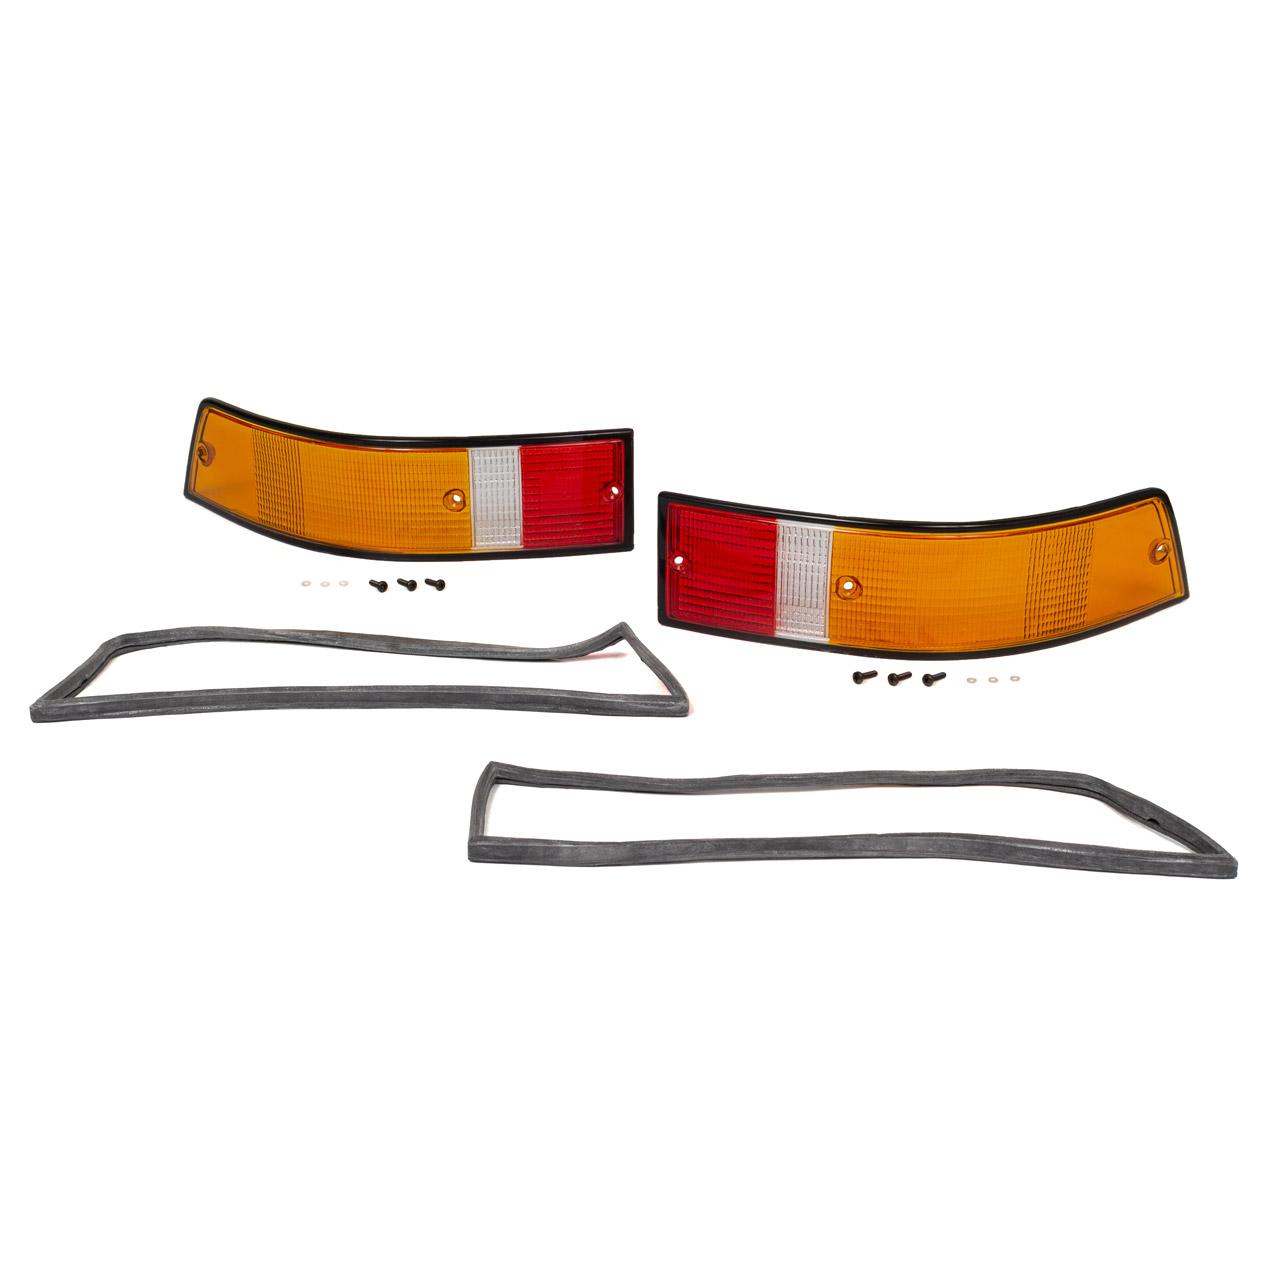 2x Rücklichtglas + Dichtung SCHWARZ EU-Version PORSCHE 911 70-90 links + rechts